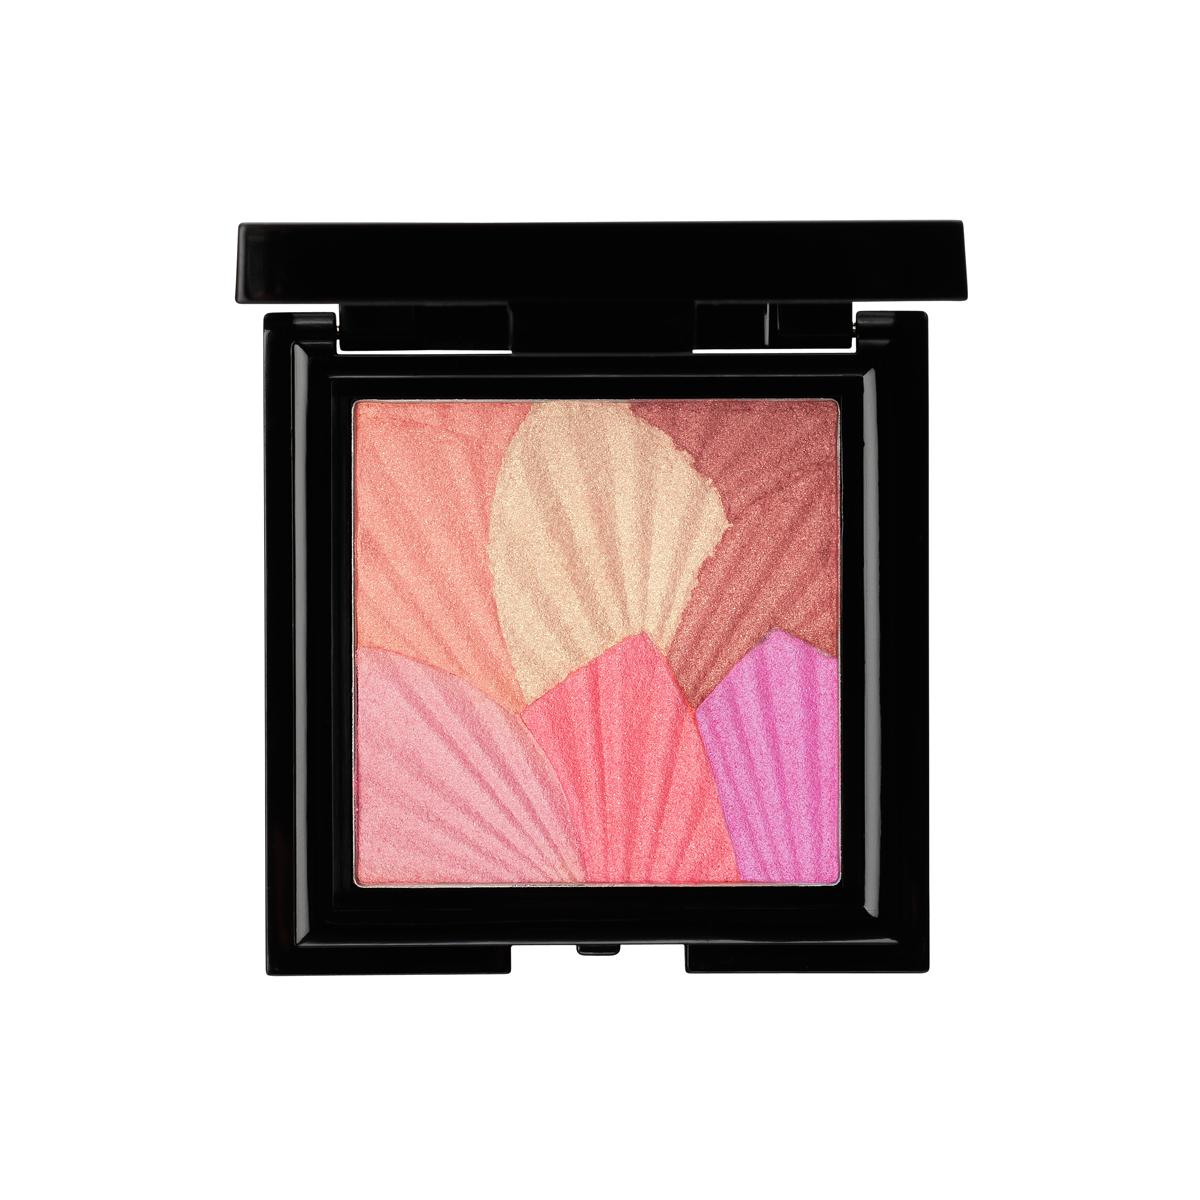 Mii Cosmetics press reviews, Celestial Skin Shimmer in Rose Quartz chosen as a Beauty Editor's Pick